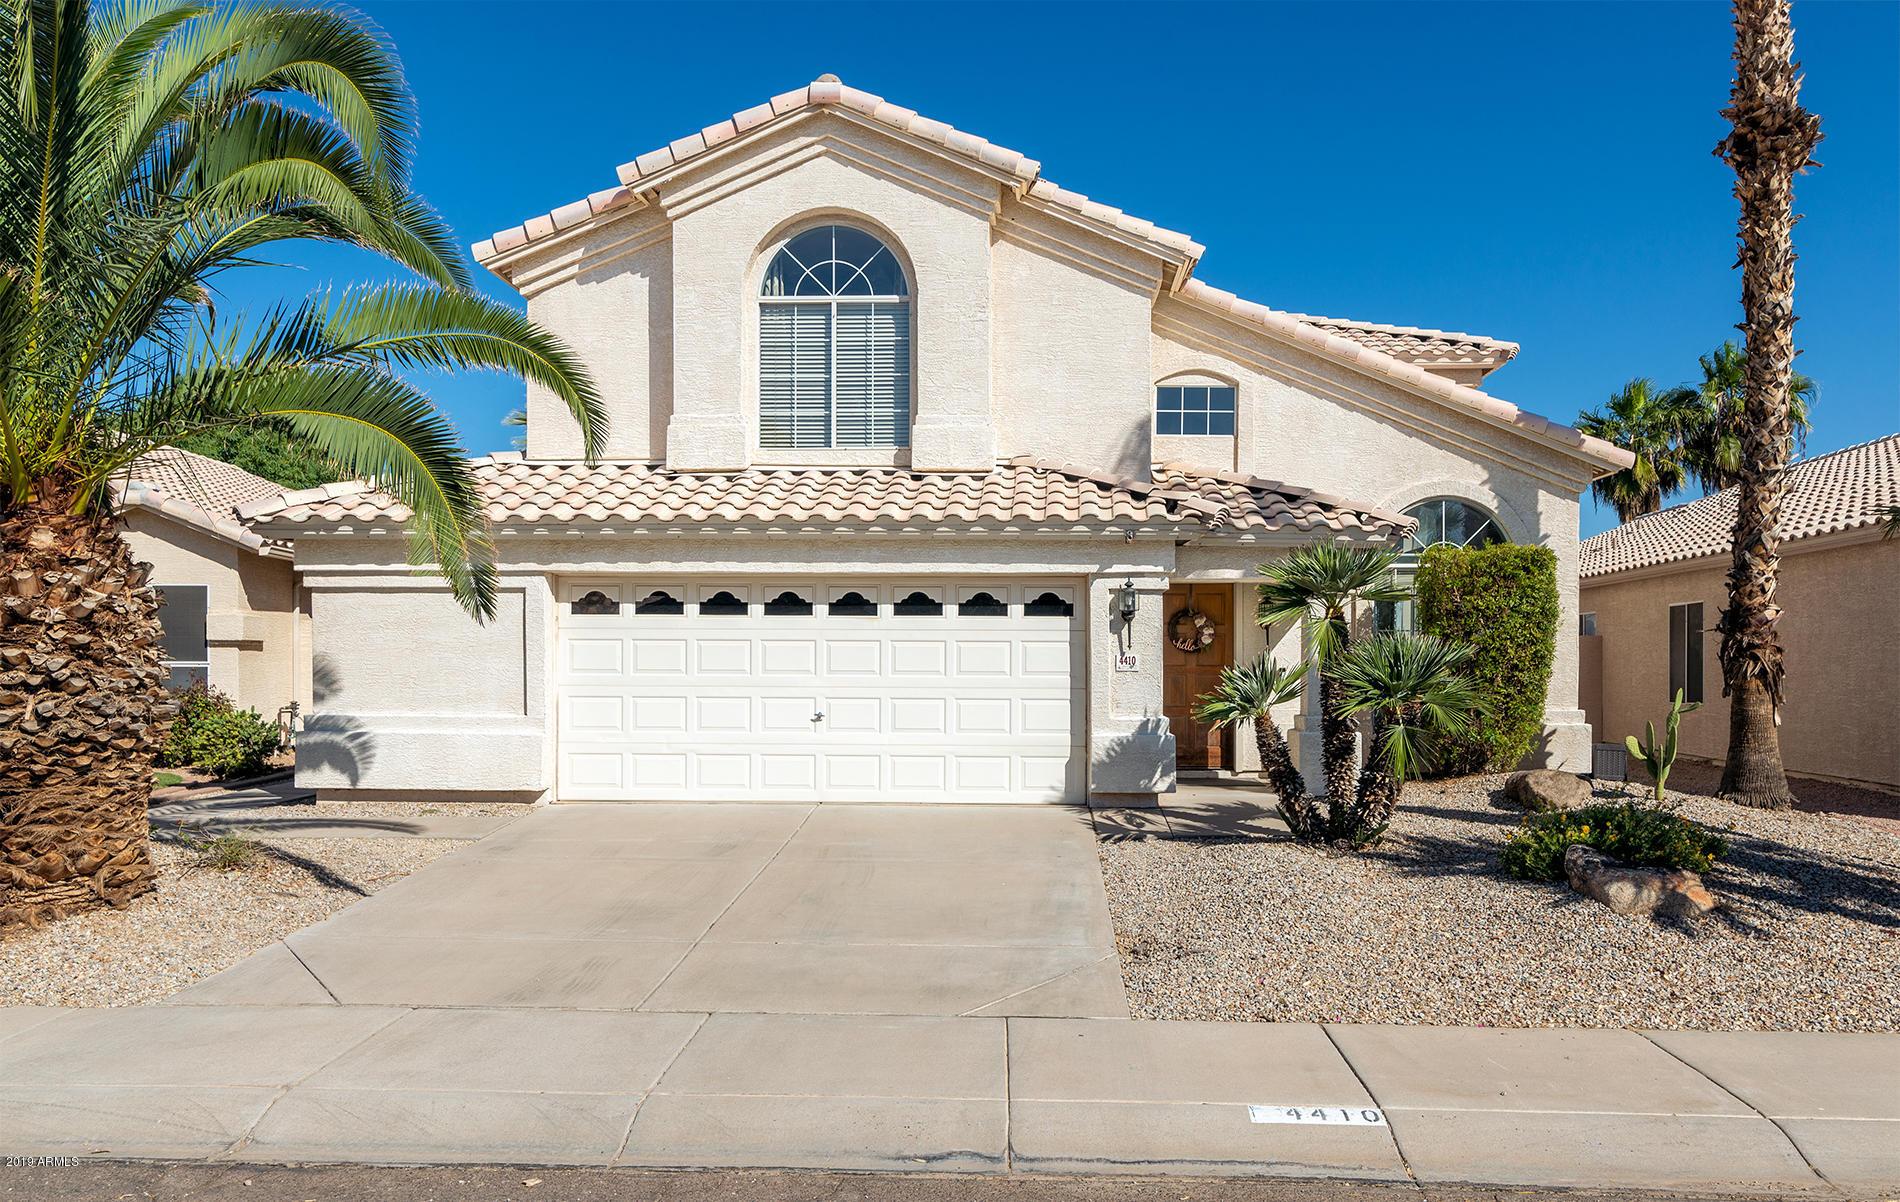 Photo of 4410 E DRY CREEK Road, Phoenix, AZ 85044